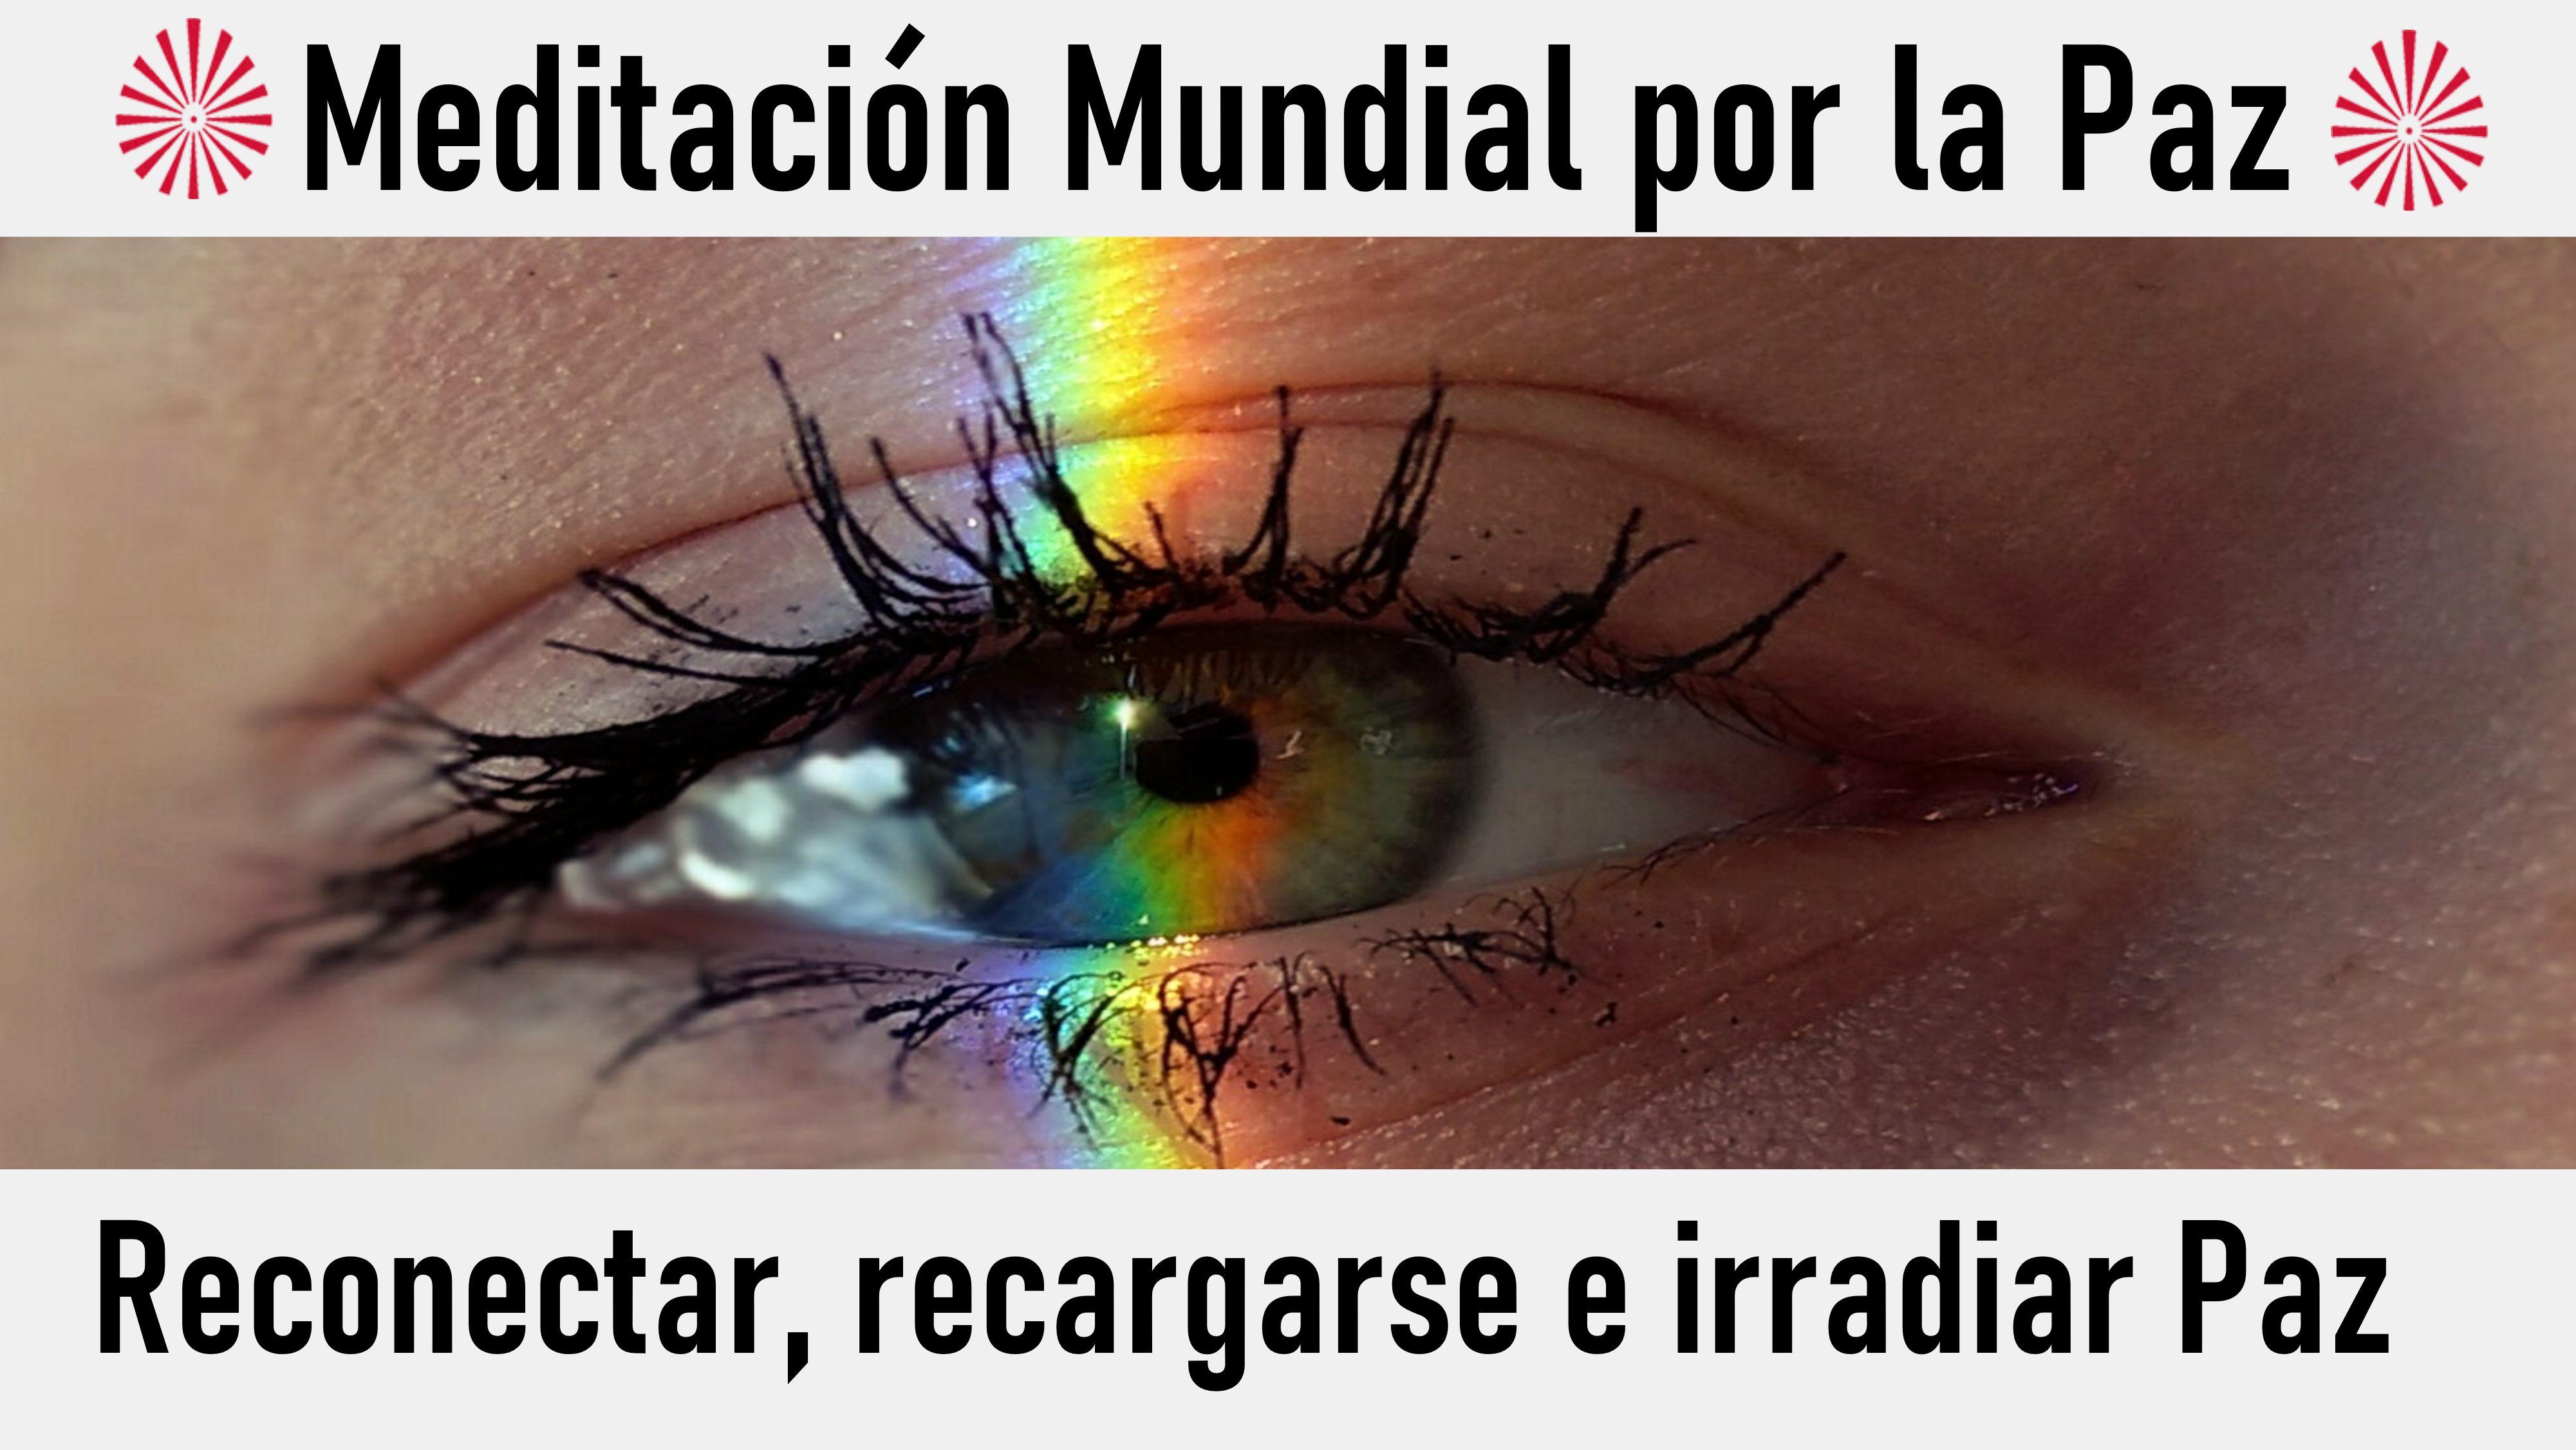 Meditación Mundial por la Paz: Reconectar, recargarse e irradiar Paz (18 Octubre 2020) On-line desde Valencia